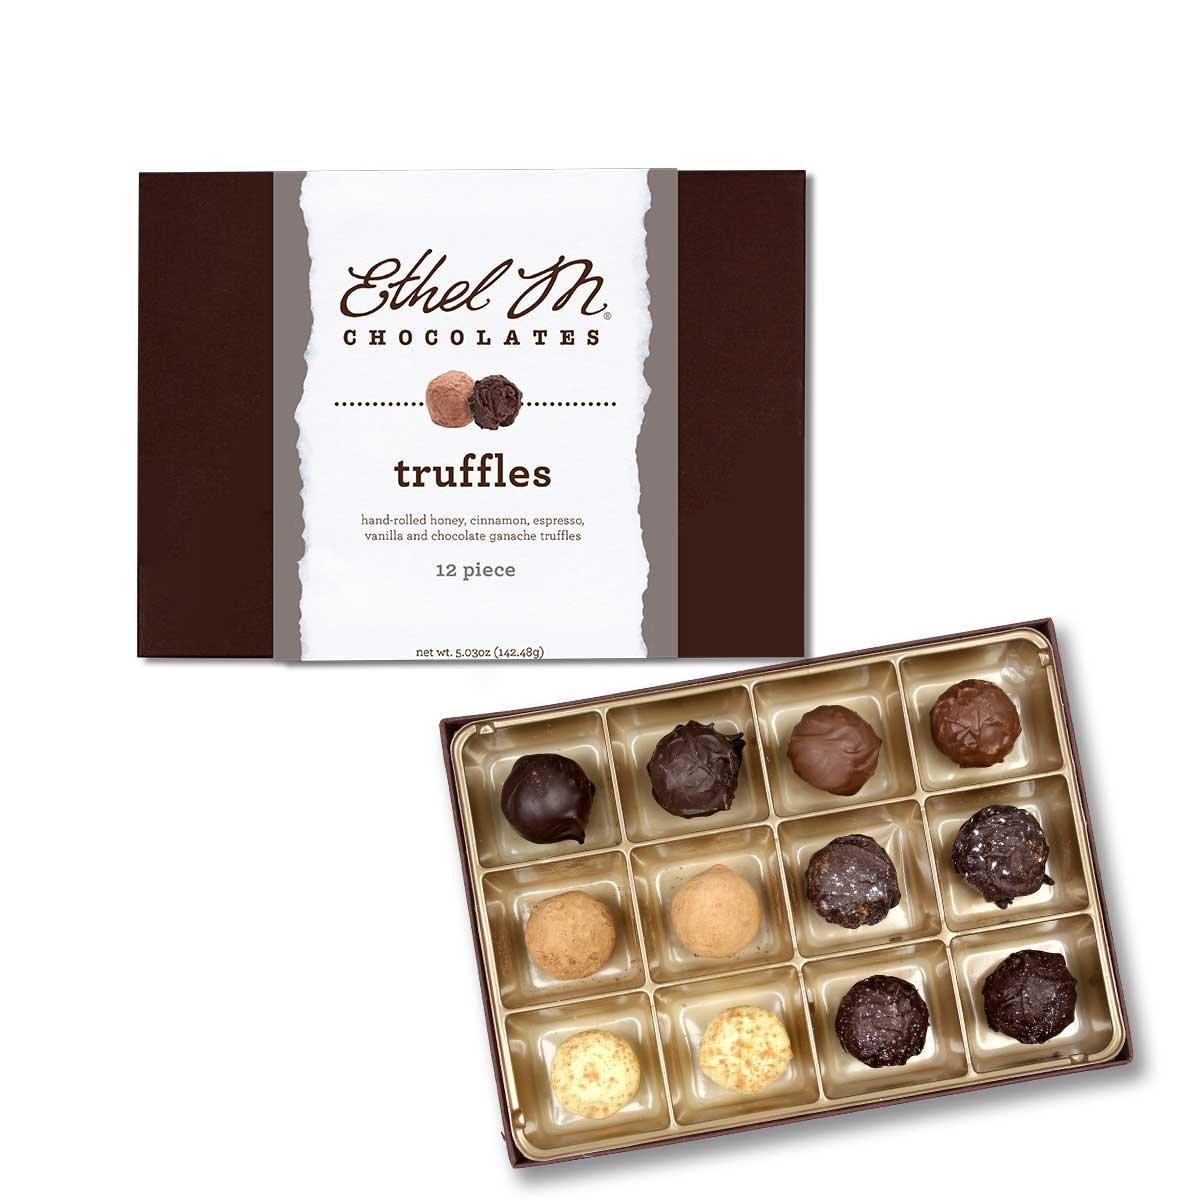 Ethel M Chocolates Truffle Collection (12 piece) by Ethel M. Chocolates